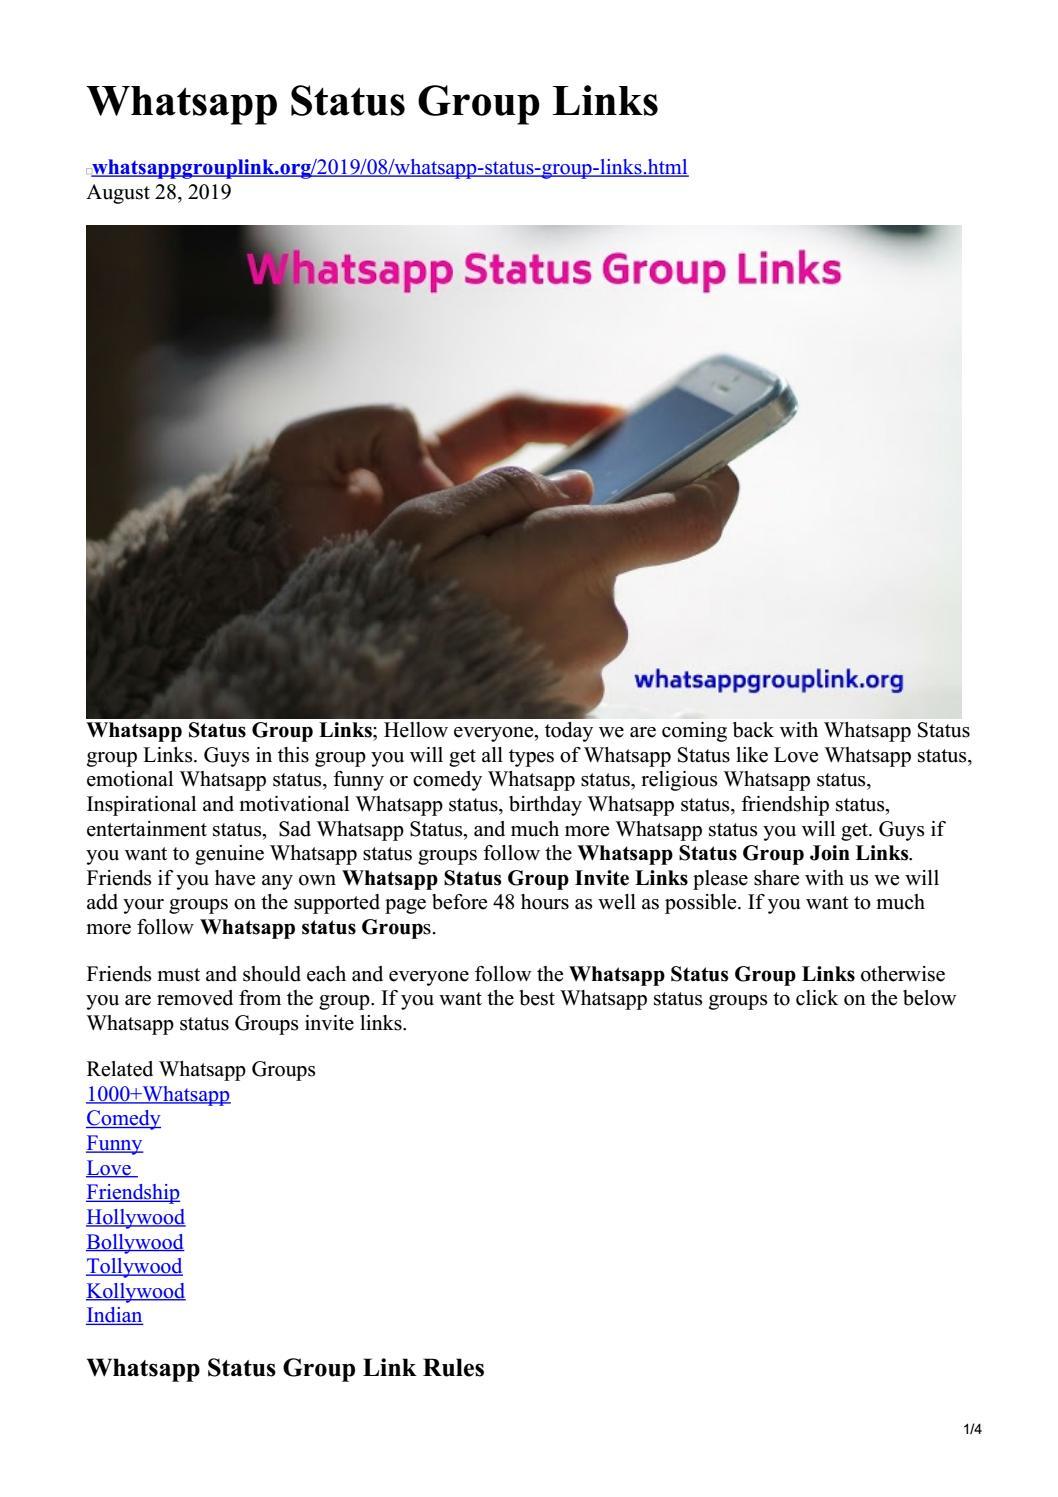 Httpswwwwhatsappgrouplinkorg201908whatsapp Status